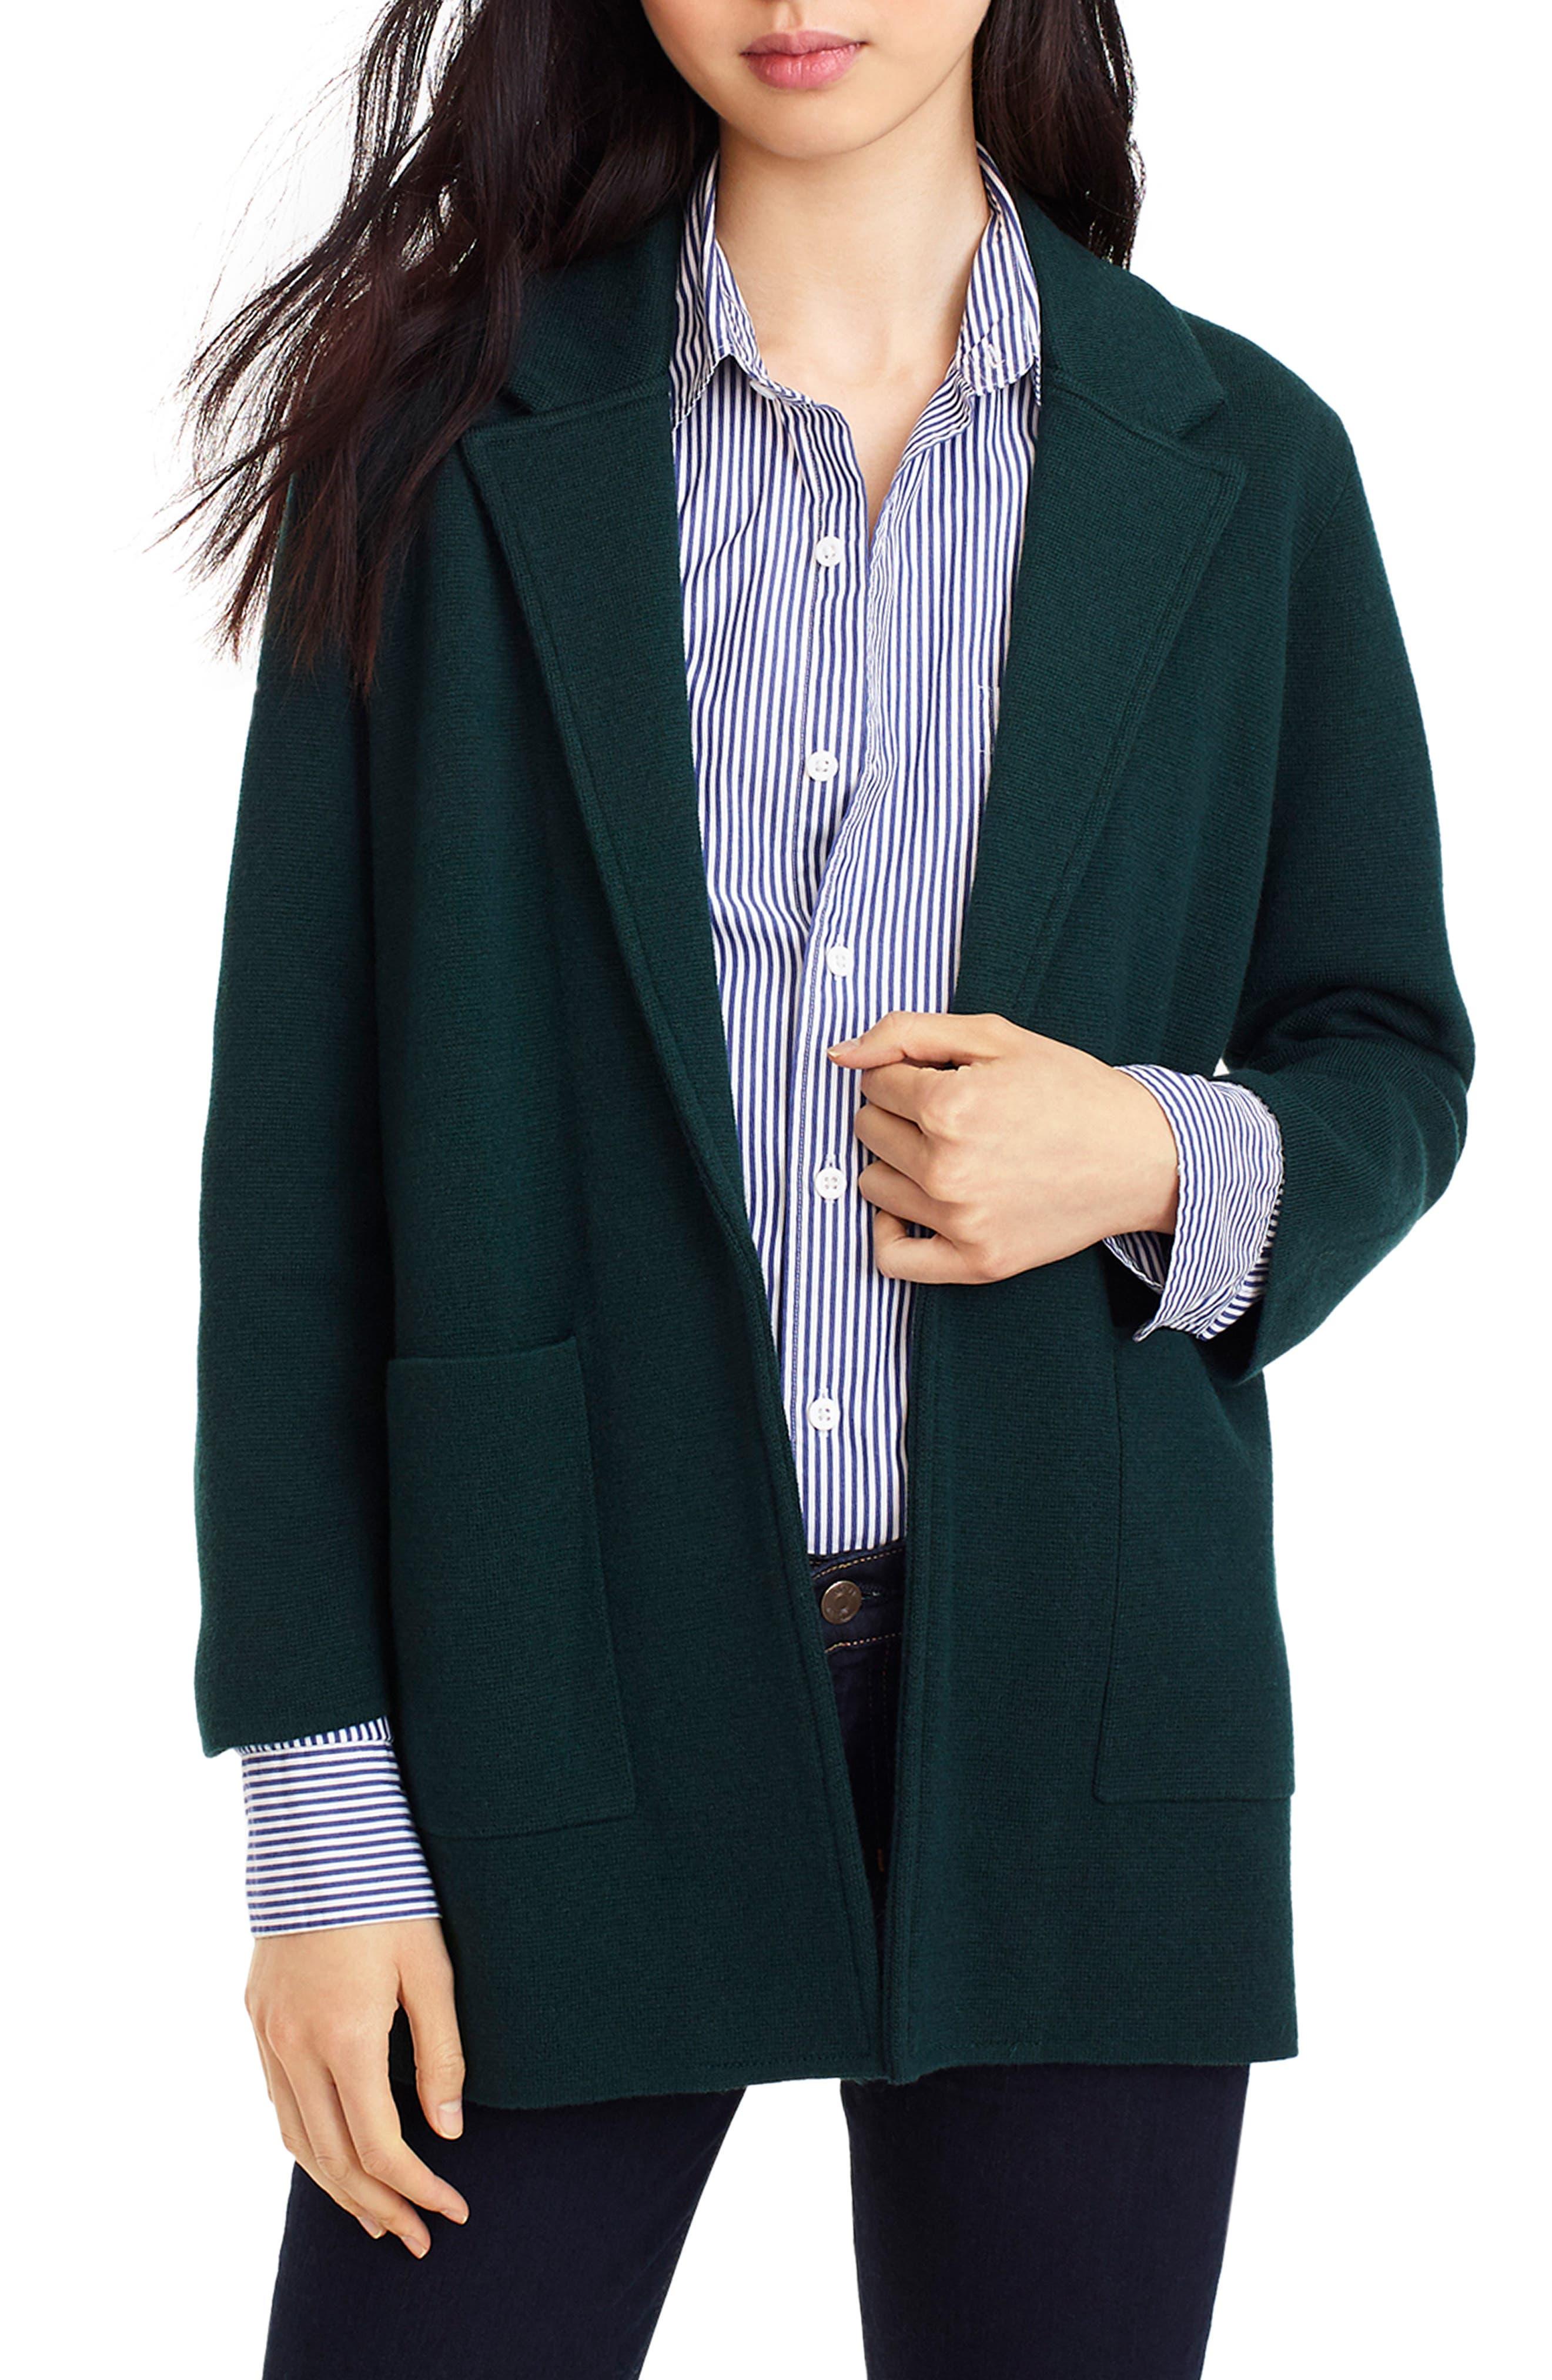 J.Crew New Lightweight Sweater Blazer (Regular & Plus Size)